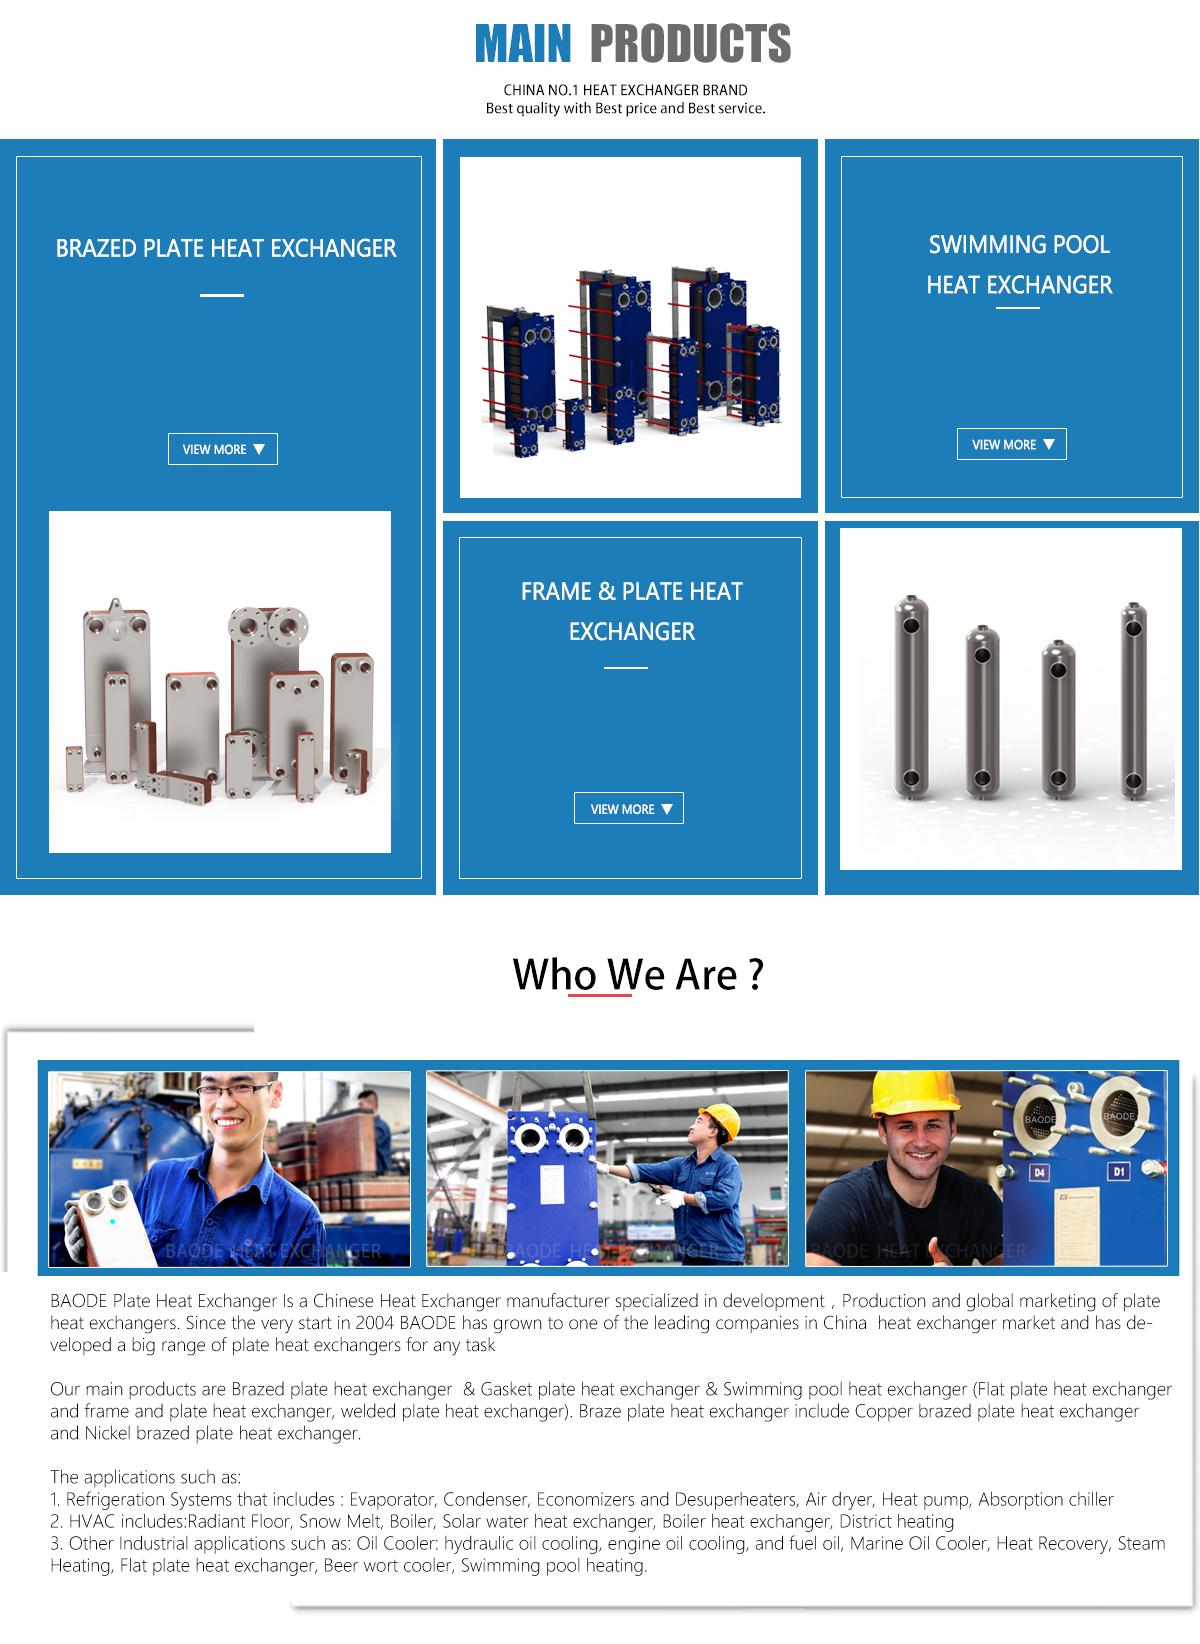 Jiangsu Baode Heat-Exchanger Equipment Co., Ltd. - Plate Heat Exchanger